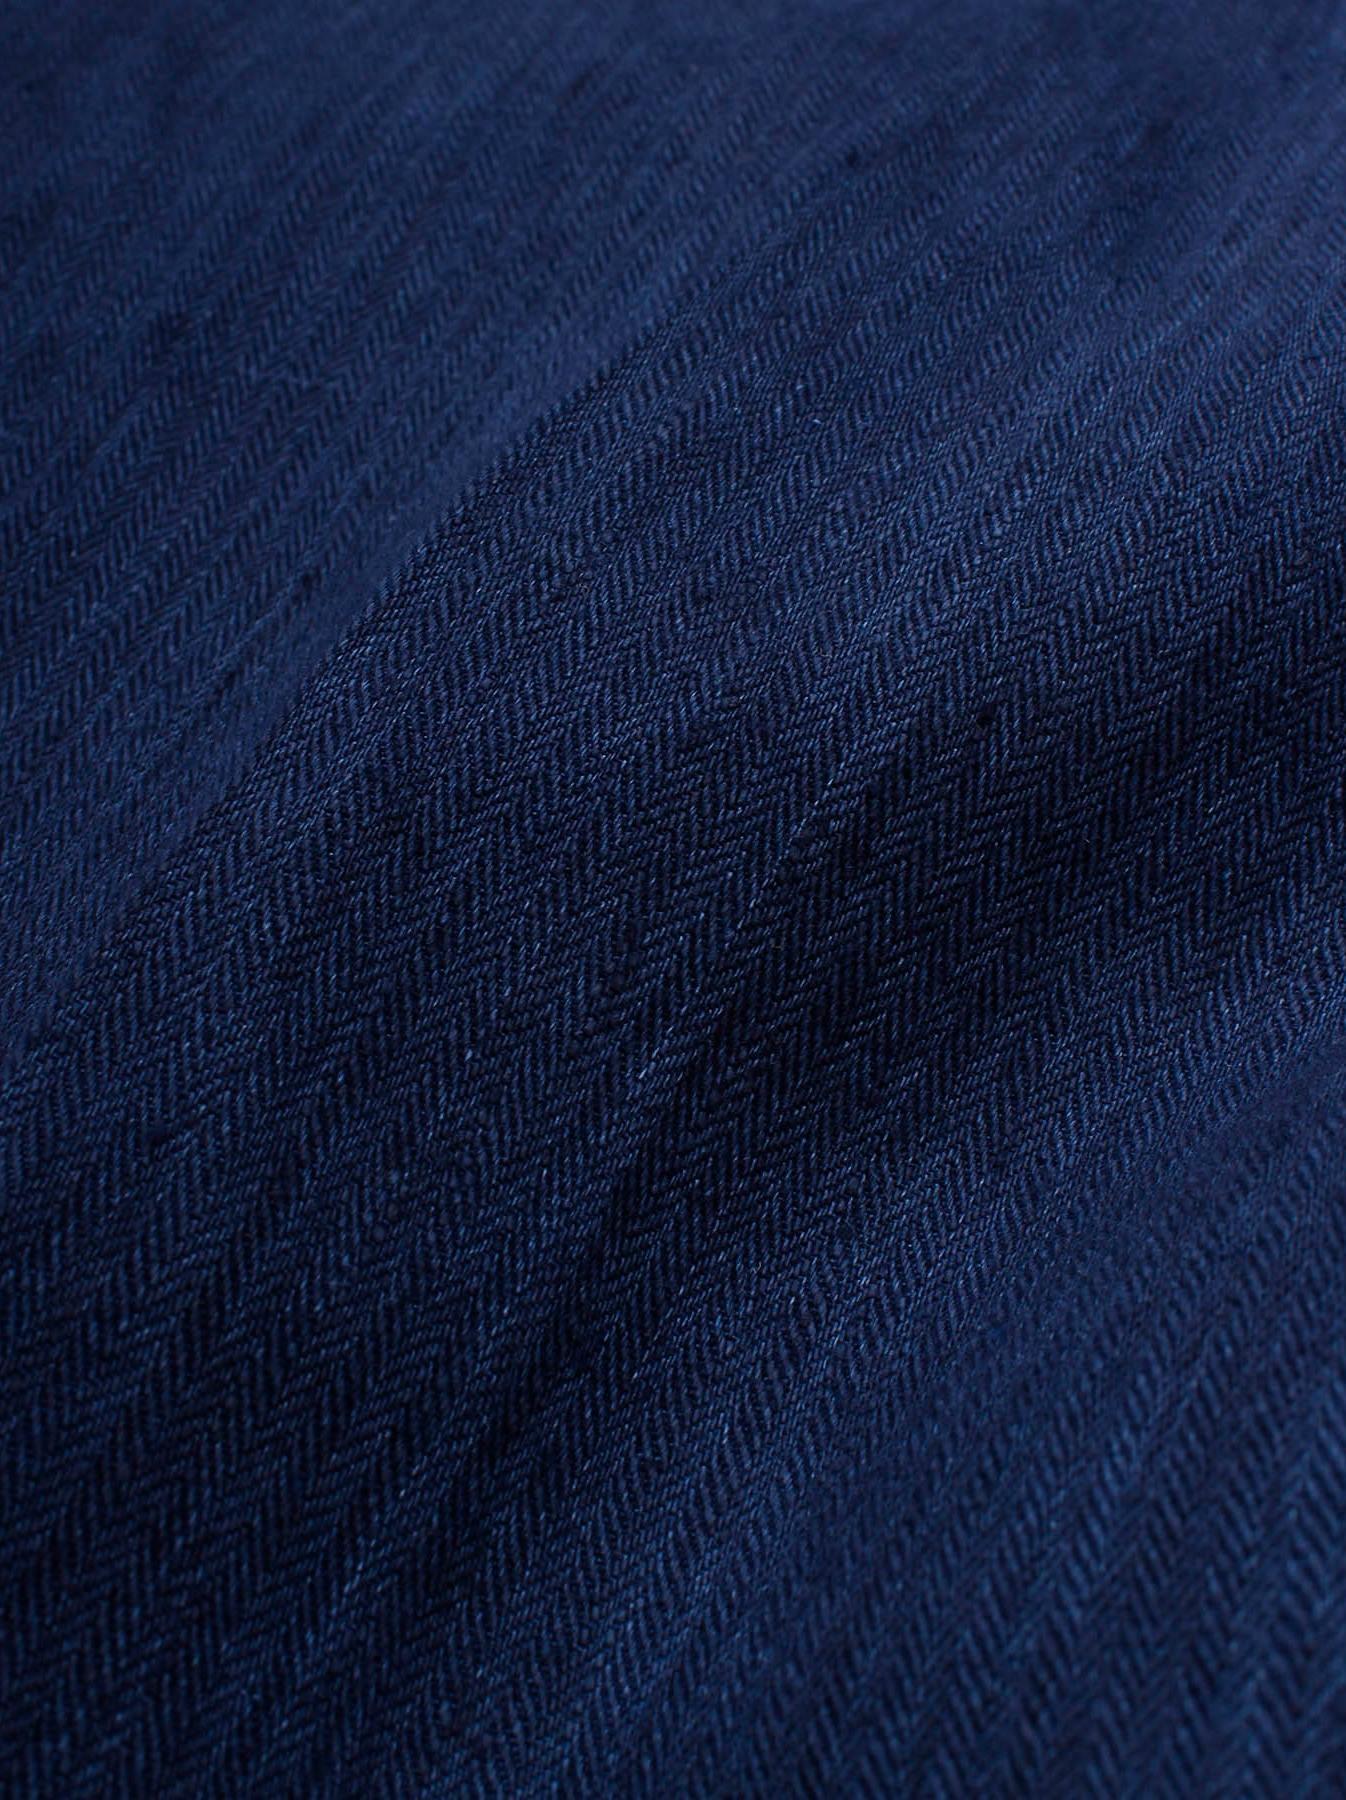 WH Indigo Linen Easy Slacks-10